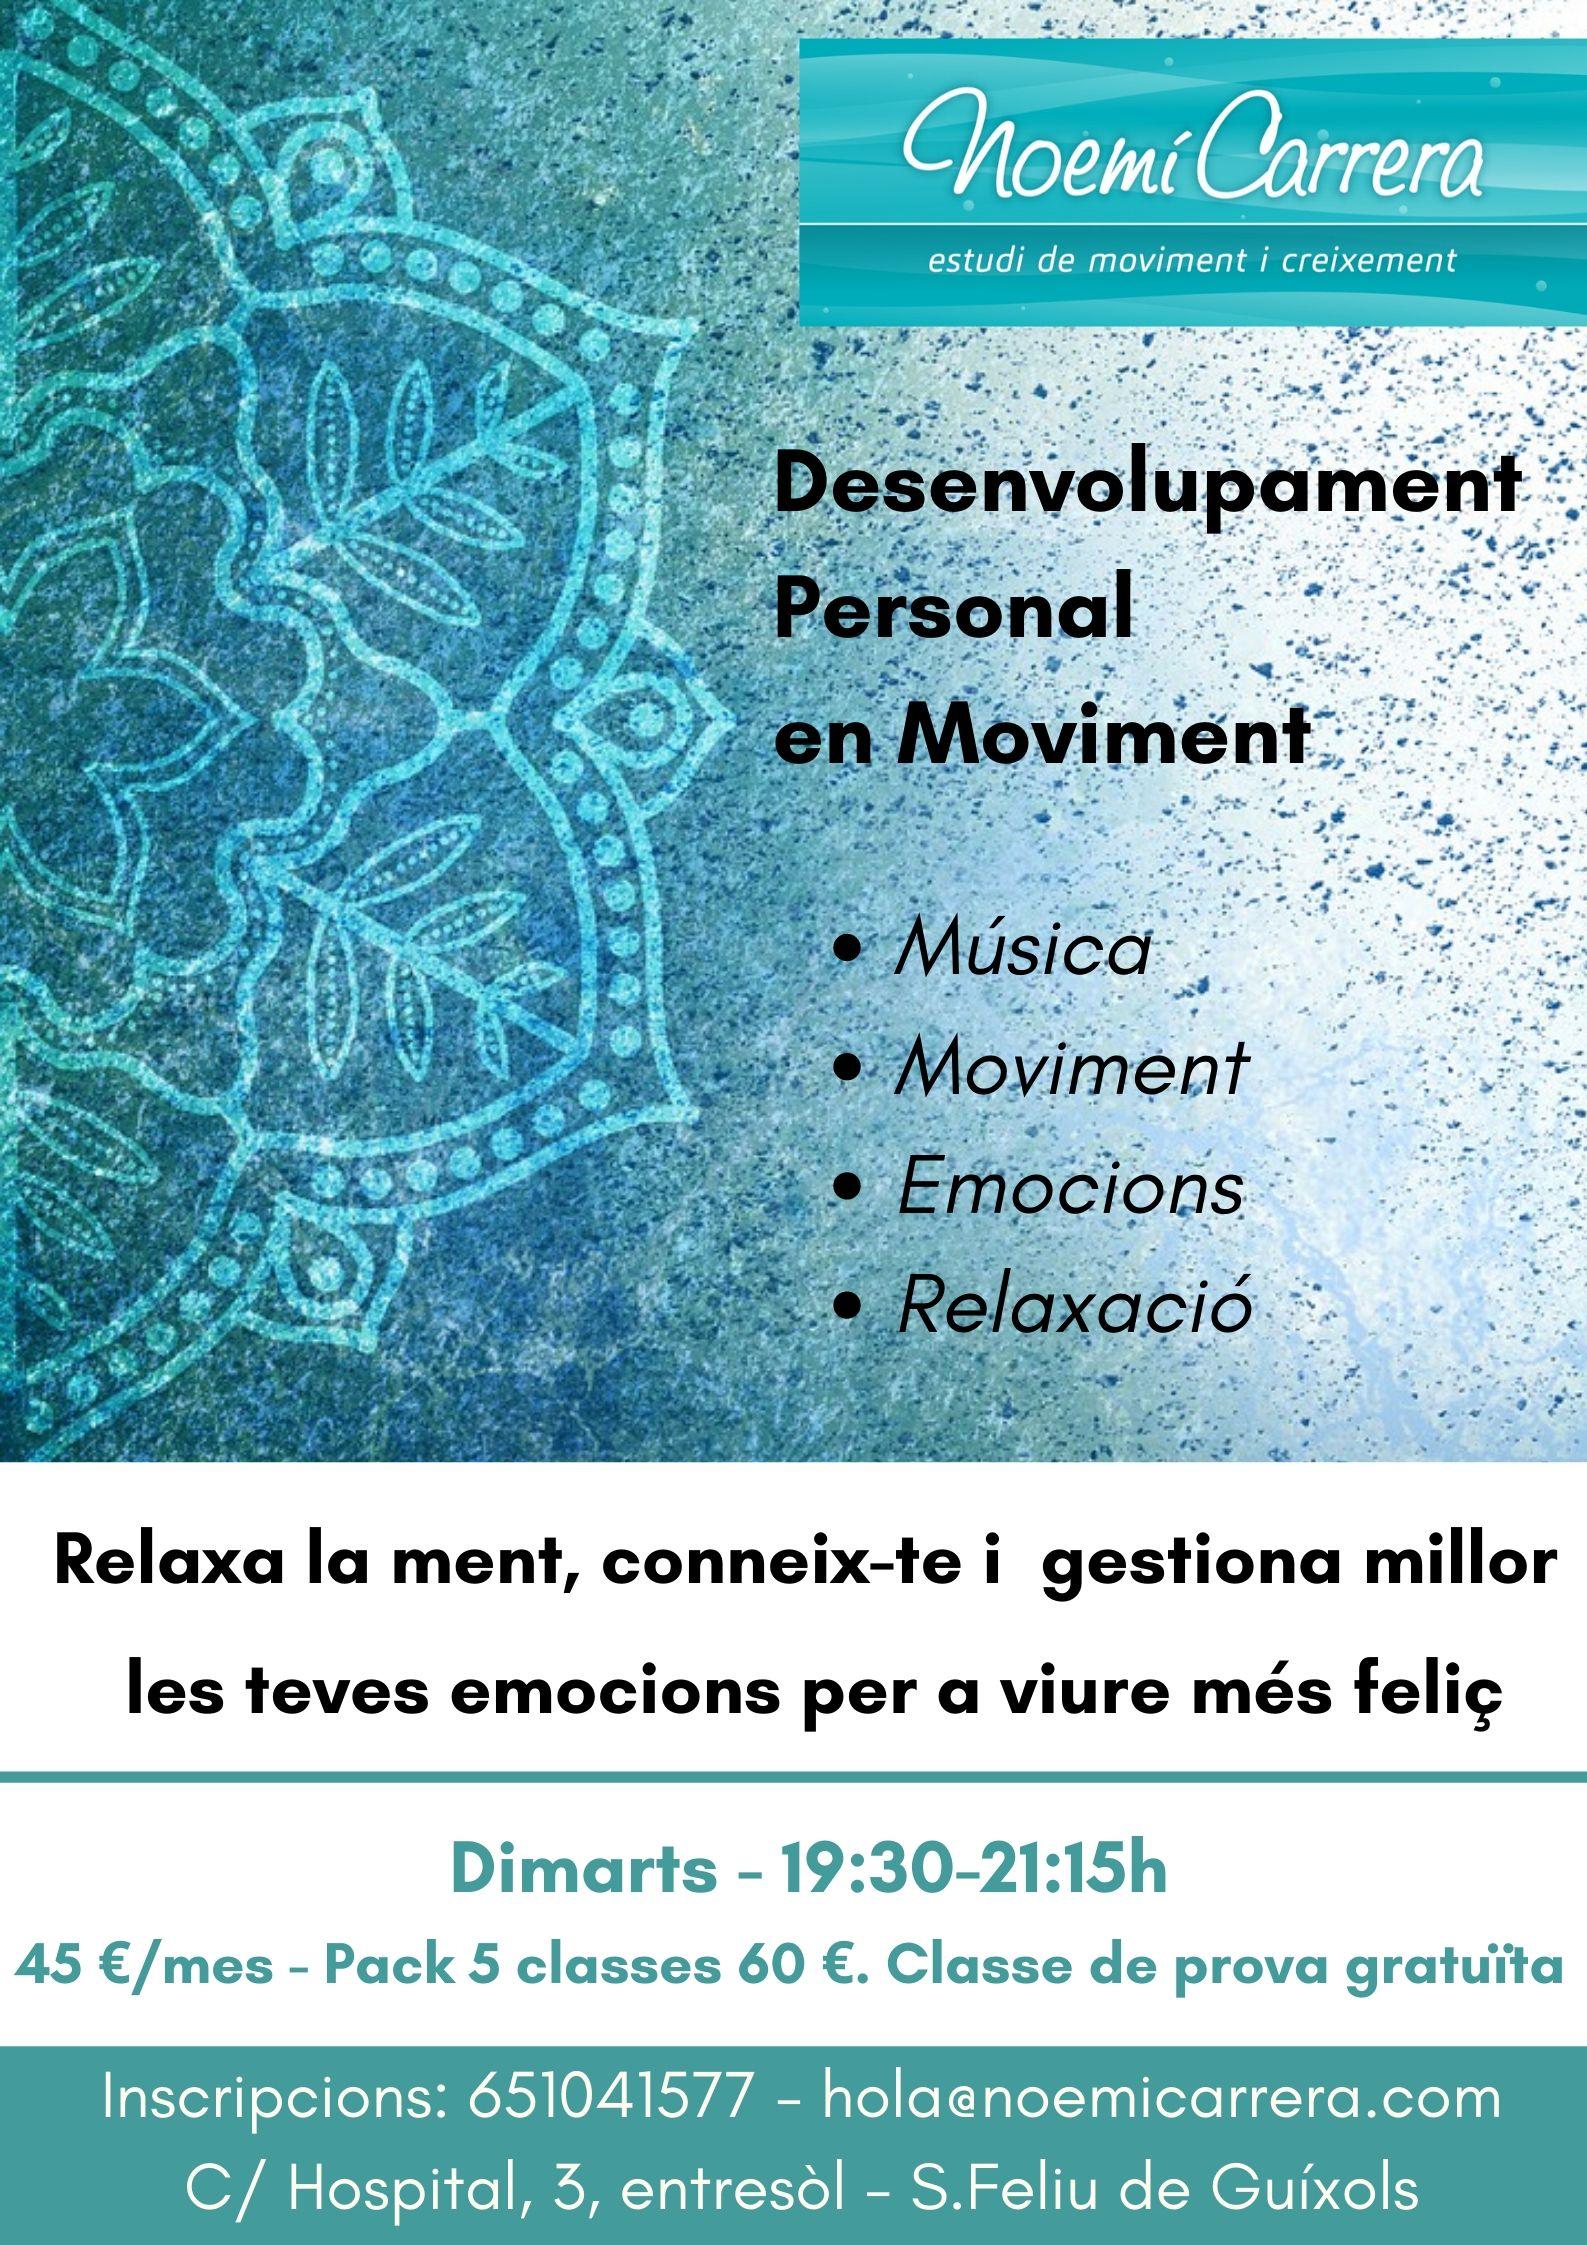 noemc3ad-carrera-desenvolupament-personal